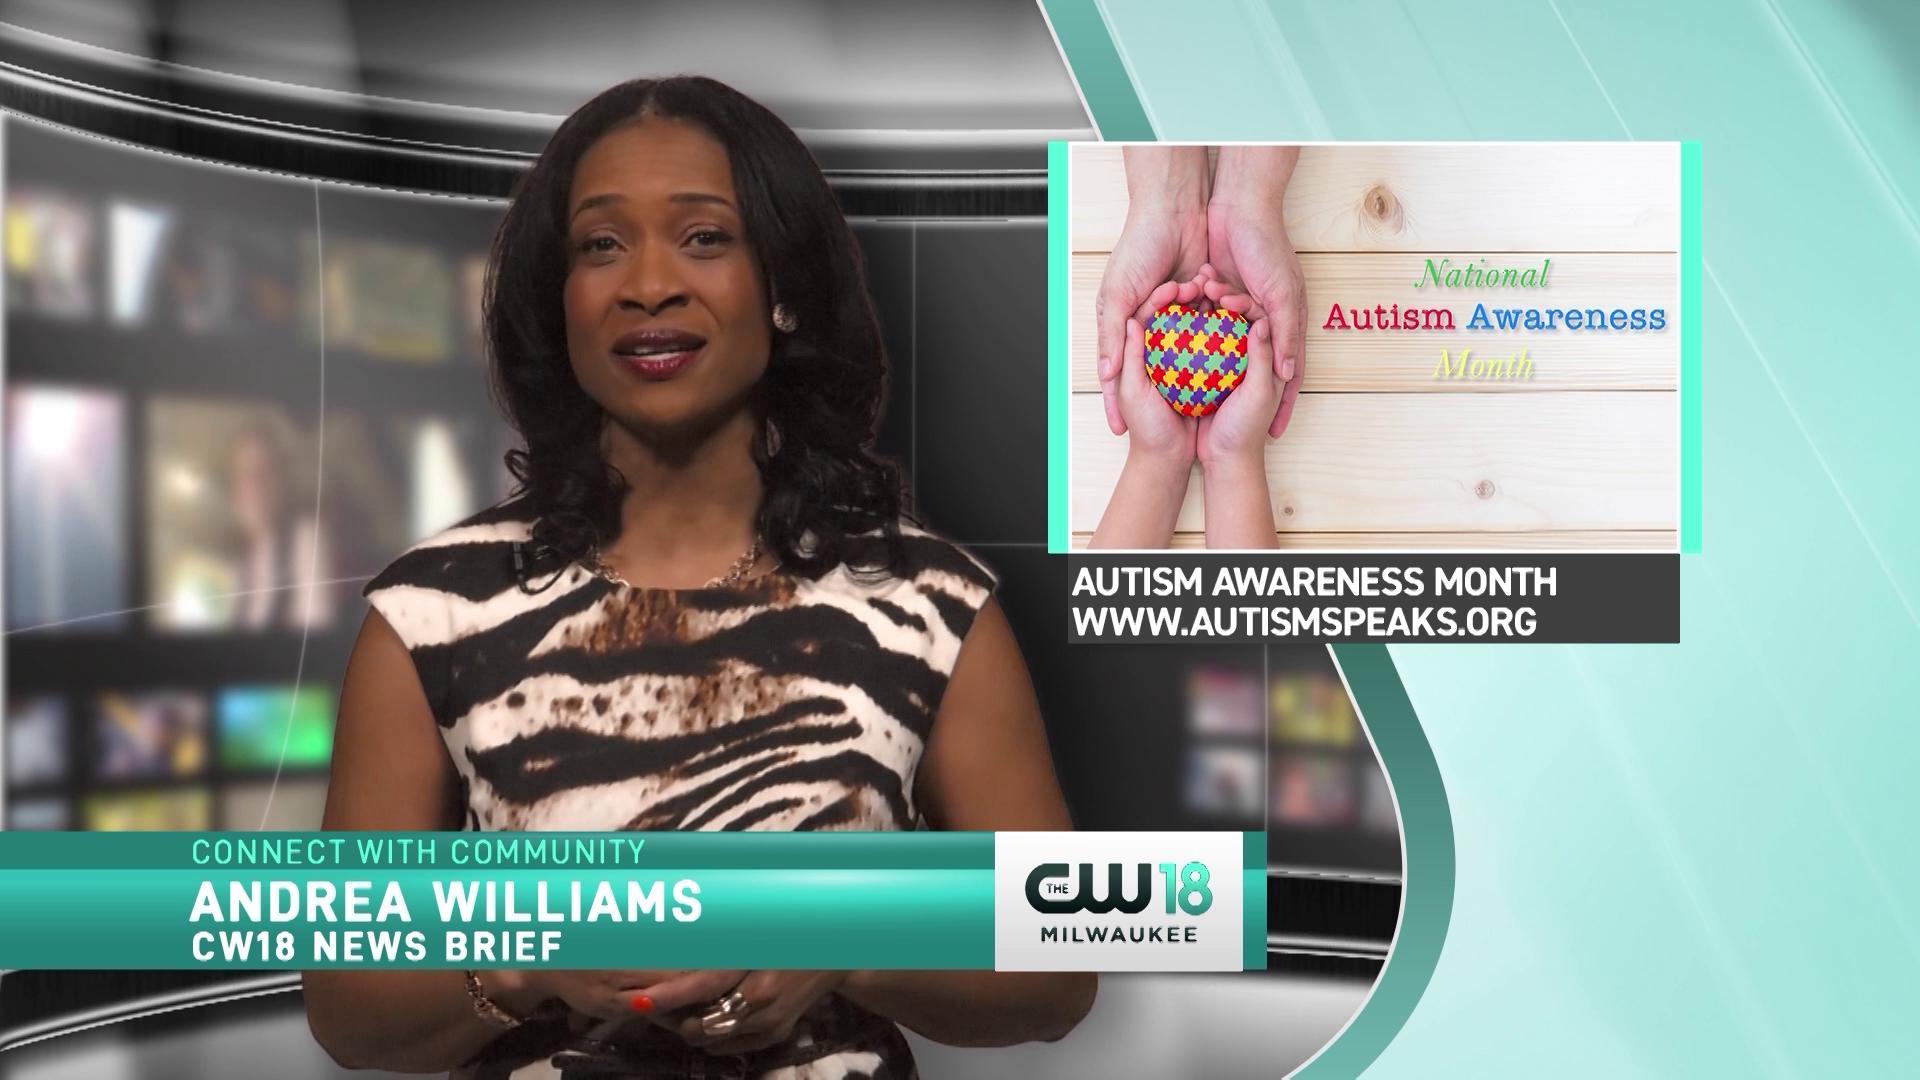 CW 18 News Brief | Autism Awareness Month